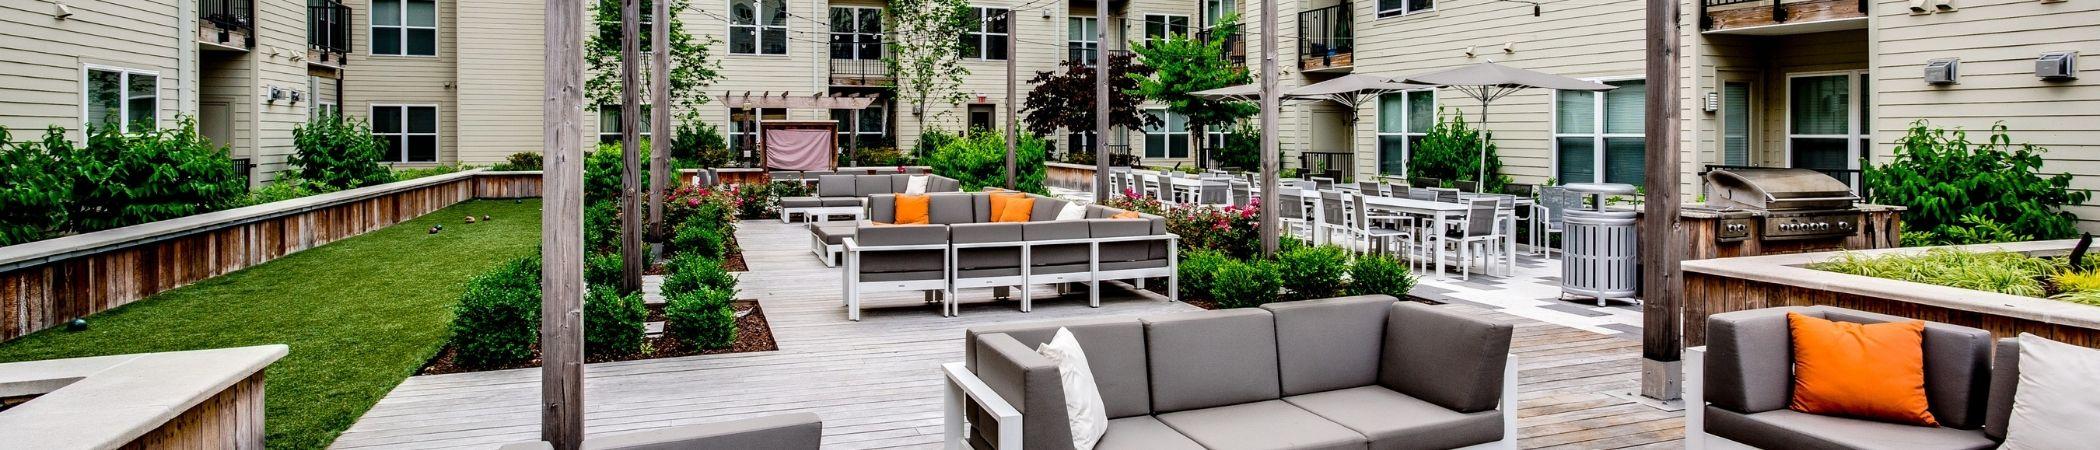 esplande complete landscaping service portfolio